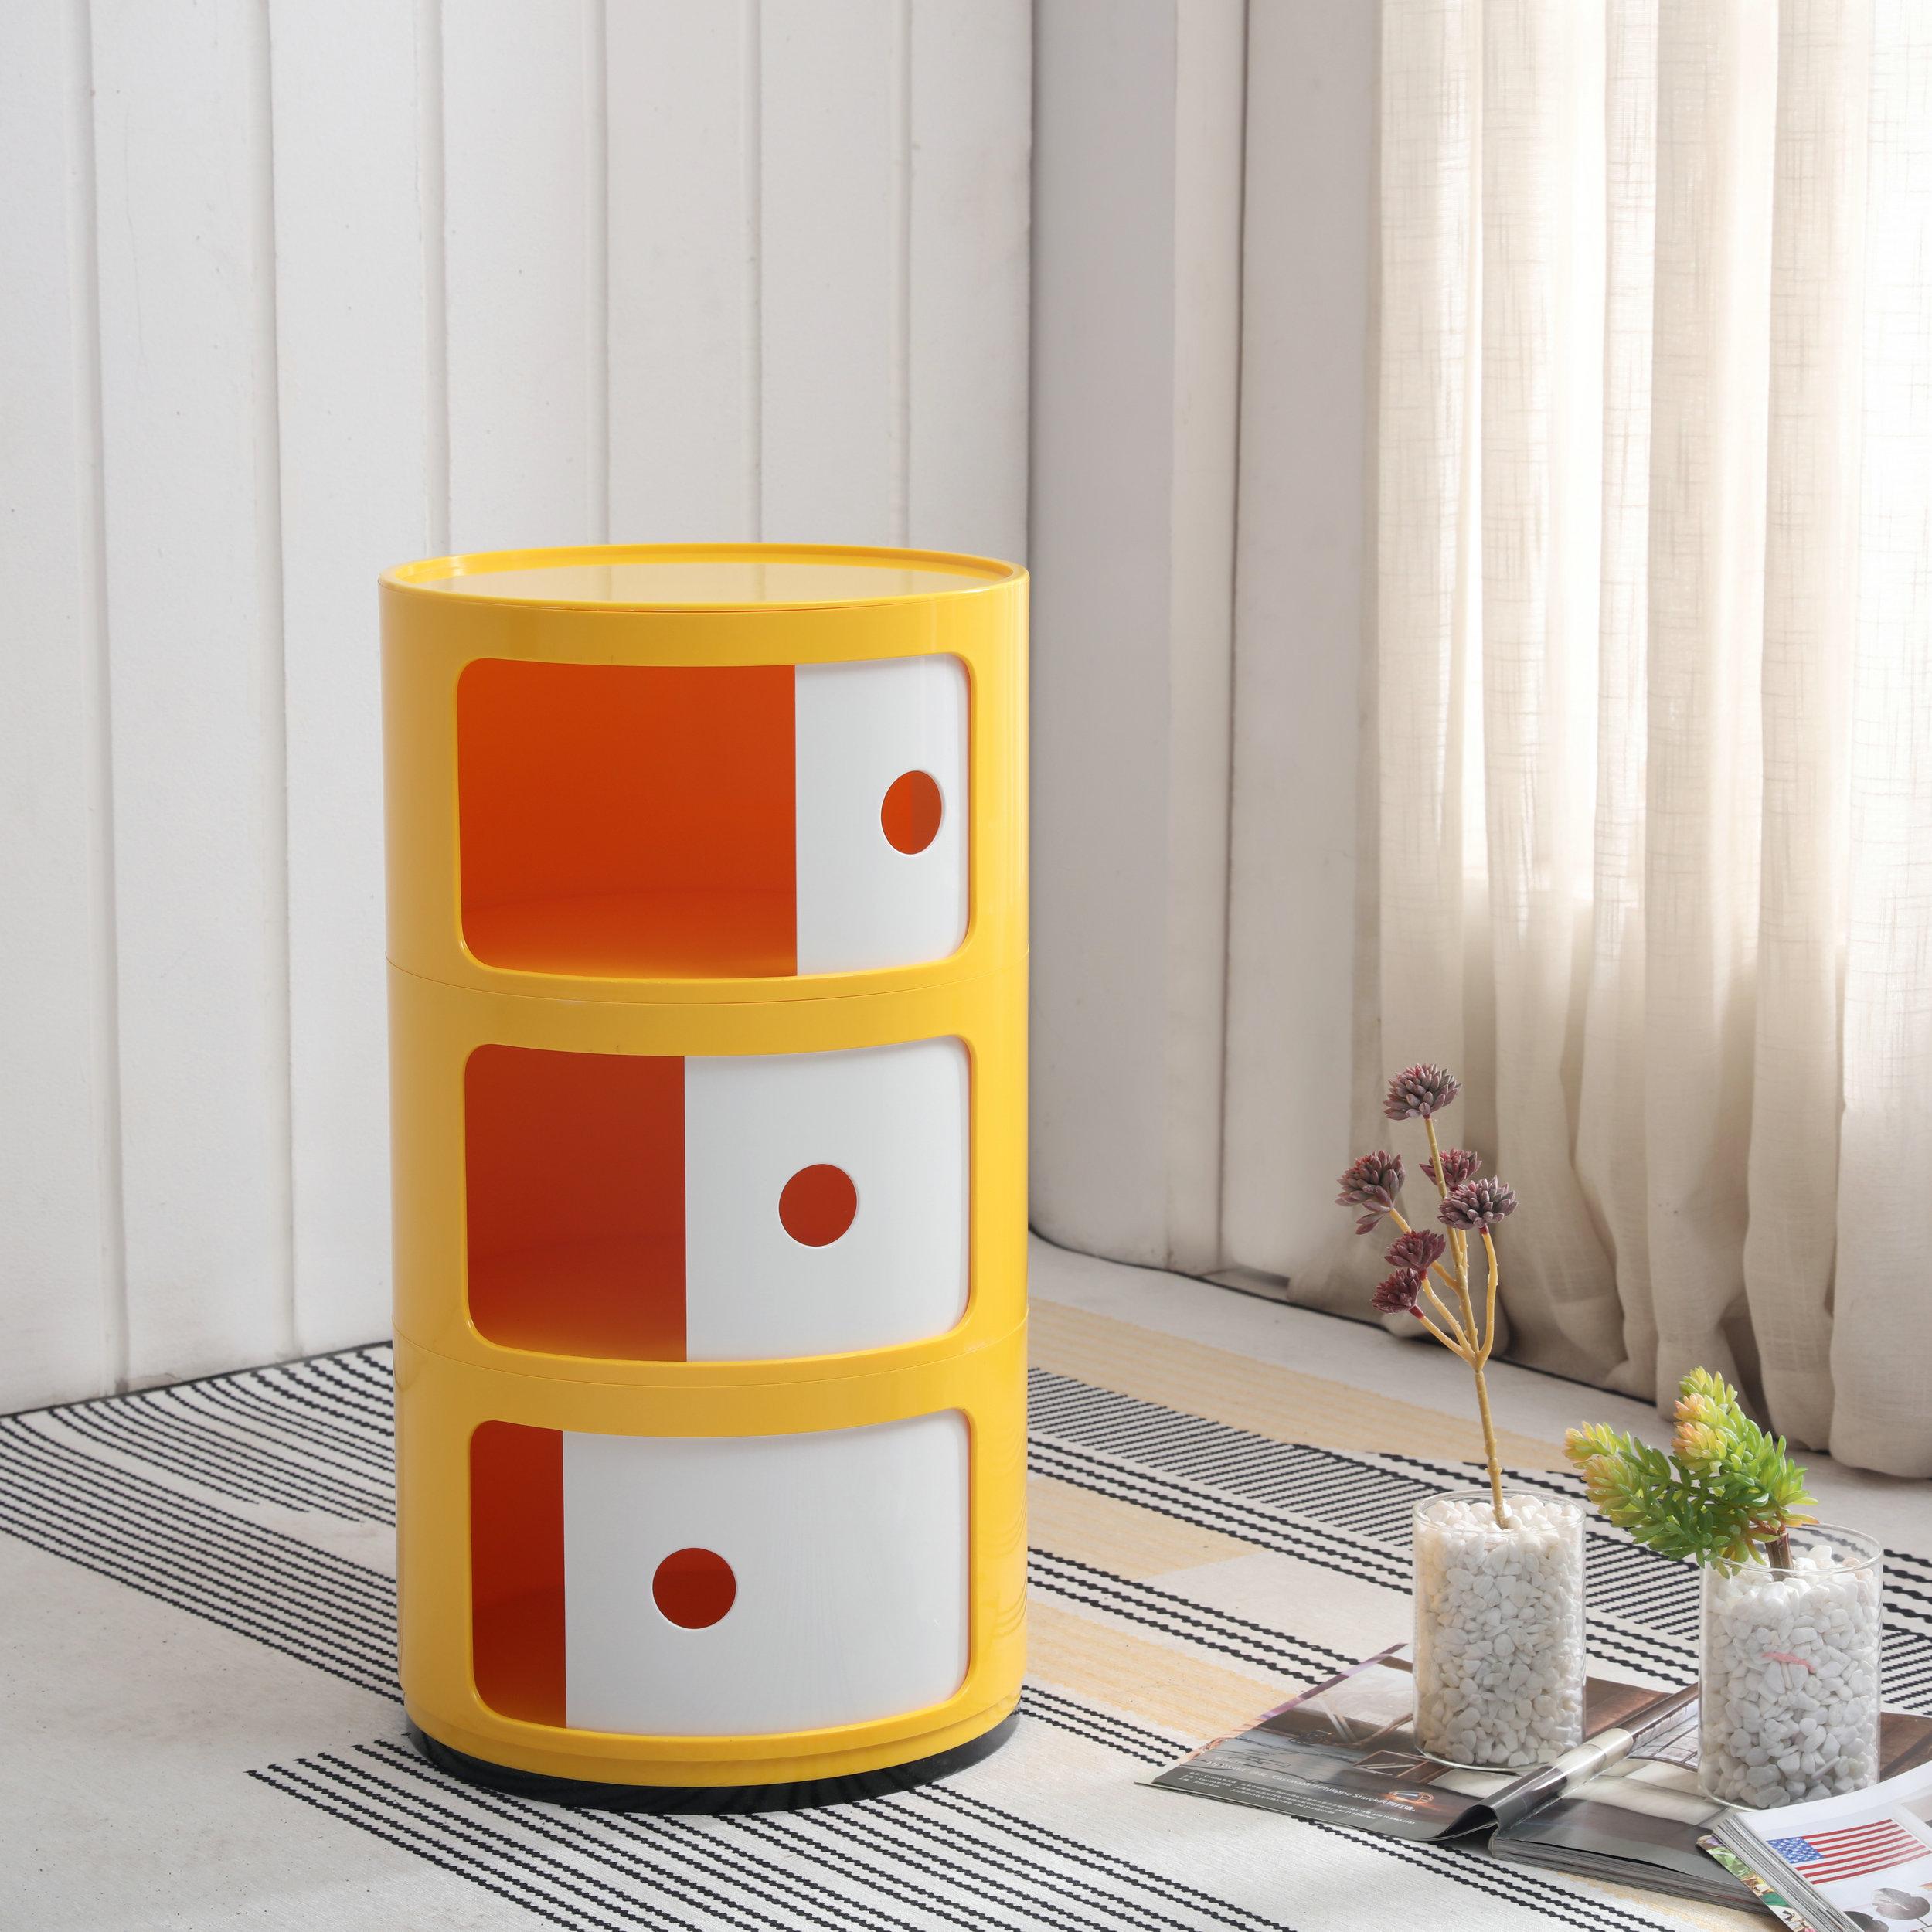 Round compartment Plastic narrow Storage Cabinet